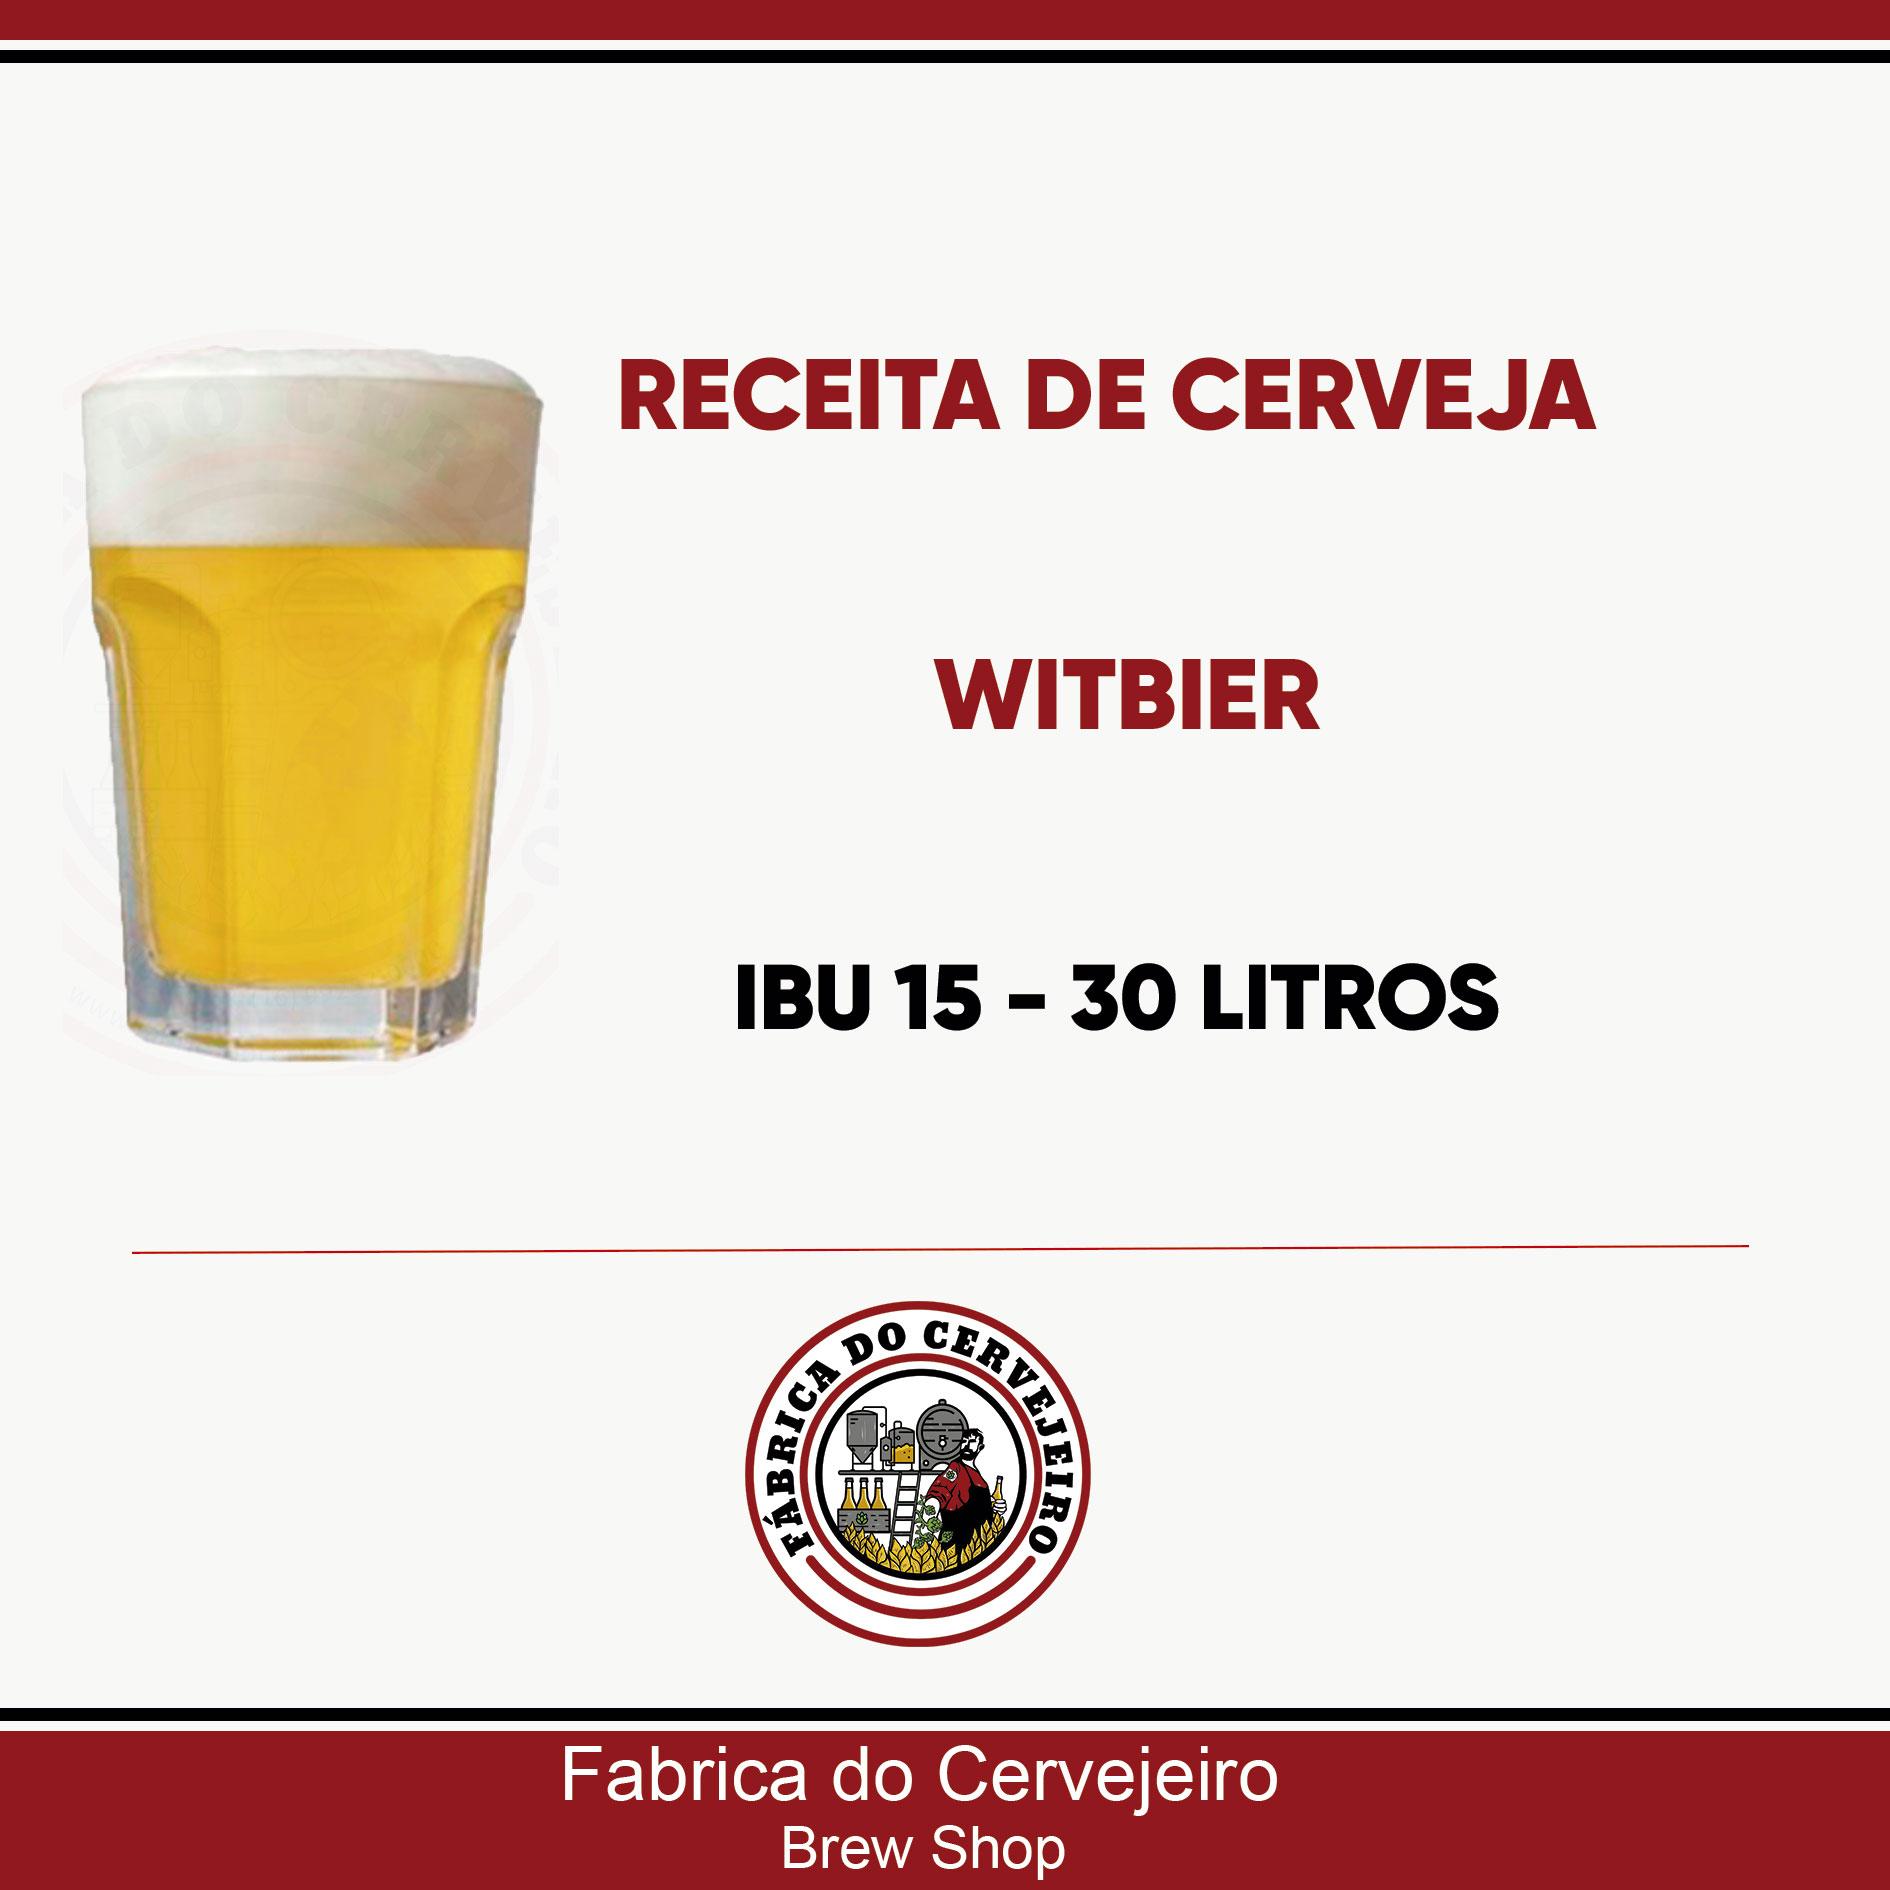 Receita de Witbier 30 Litros